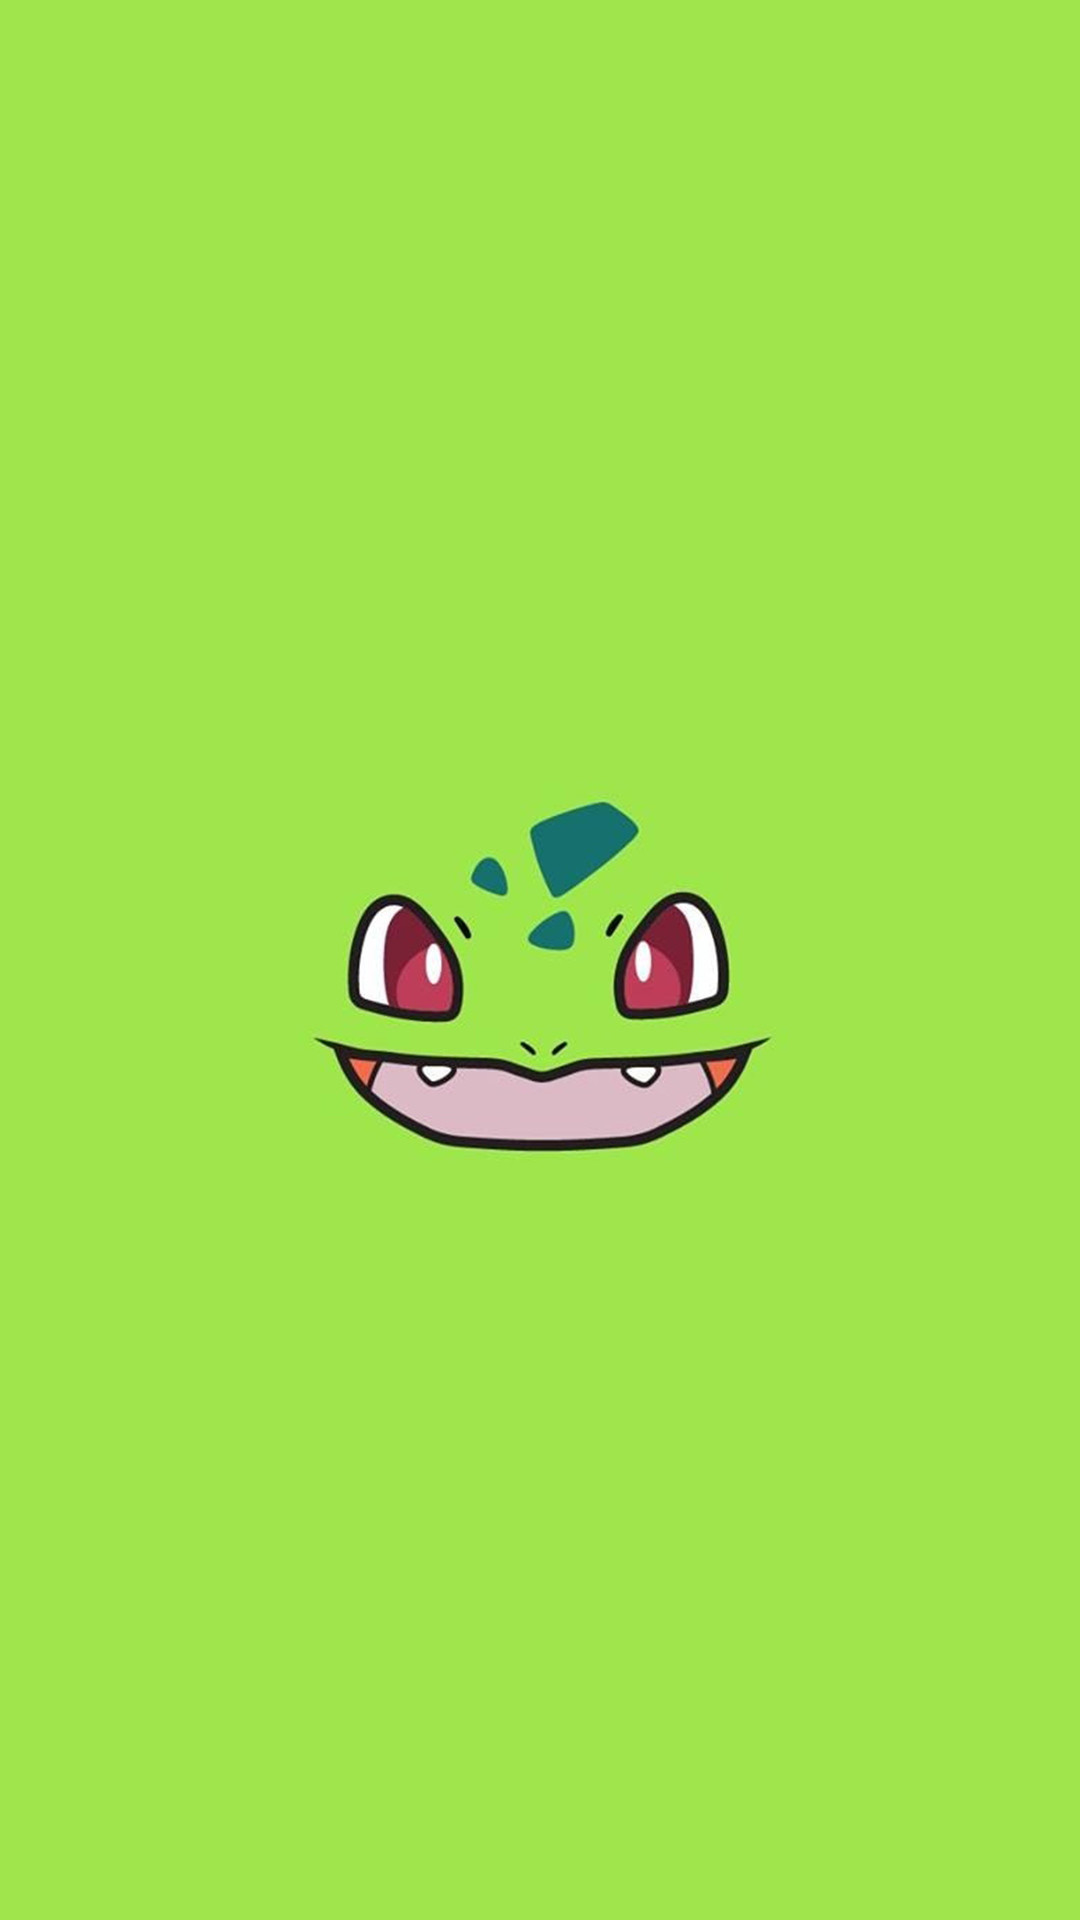 Bulbassauro Pokemon Character iPhone 6+ HD Wallpaper –  https://freebestpicture.com